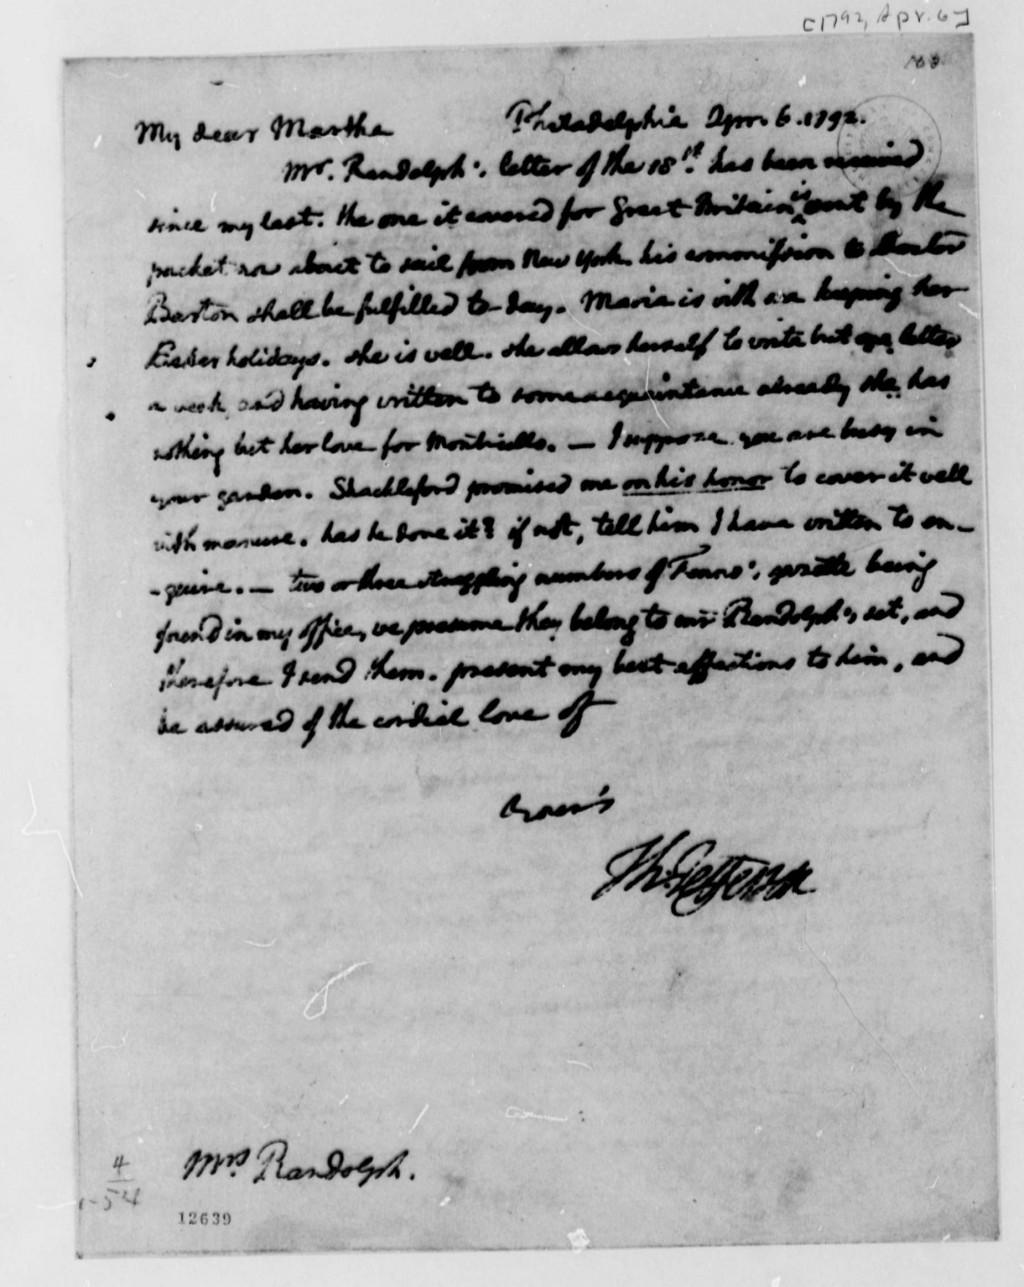 019 Thomas Jefferson Essay Magnificent On Education Questions Outline Large